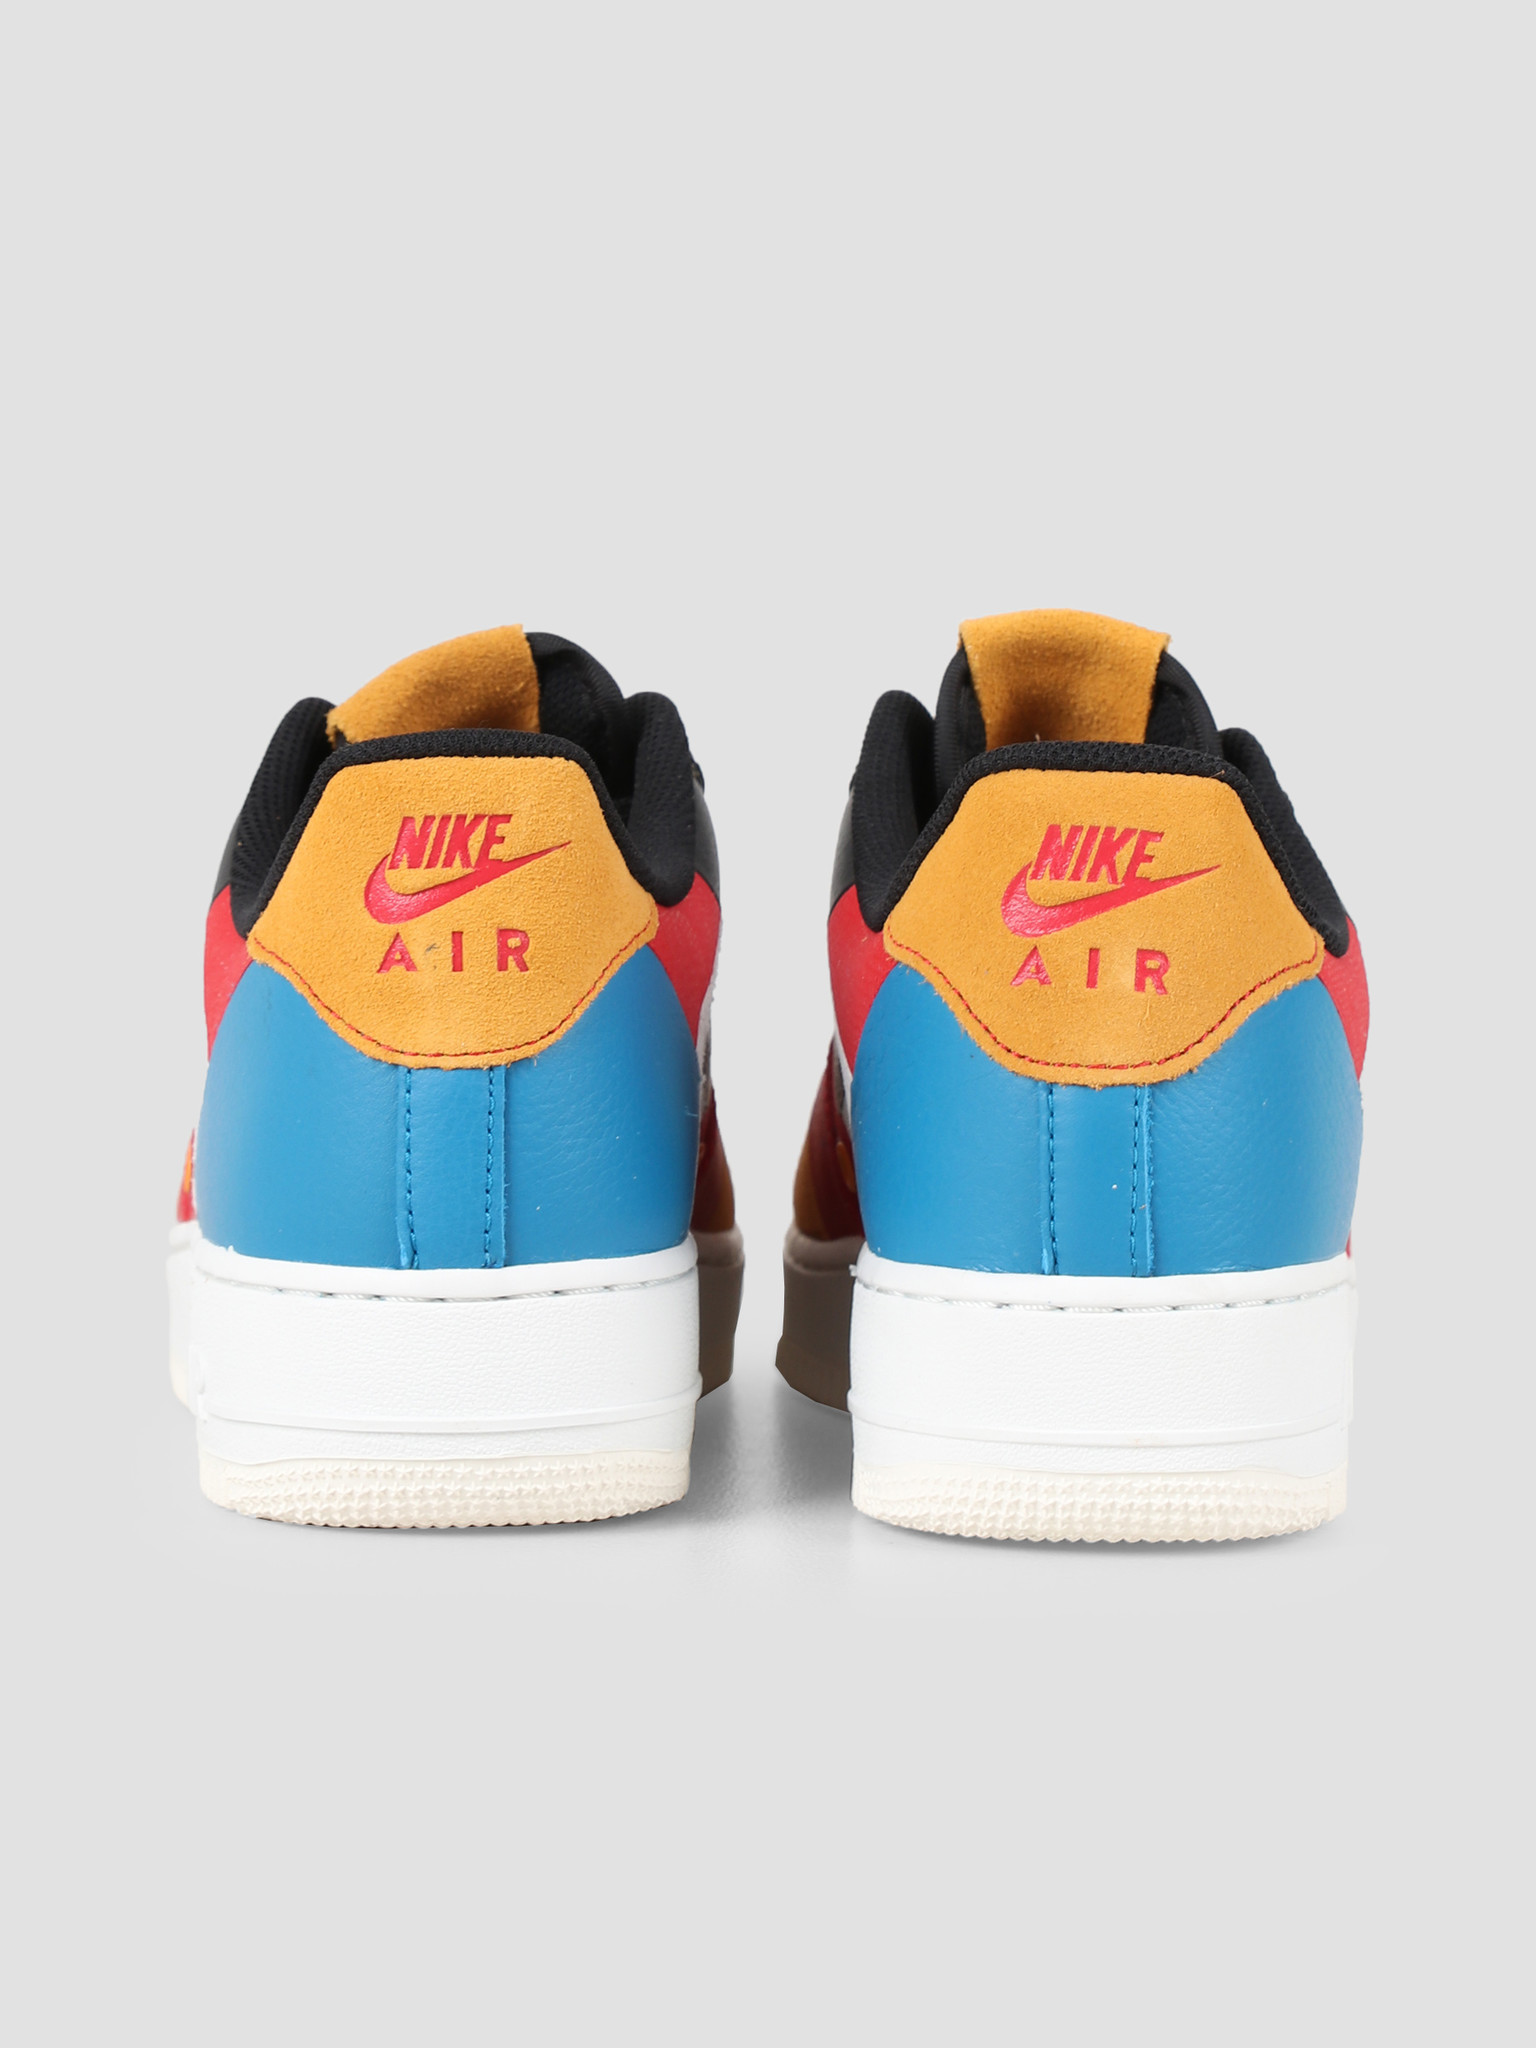 Nike Nike Air Force 1 07 Prm 1 Sail Black Imperial Blue Amber Rise CI0065-101